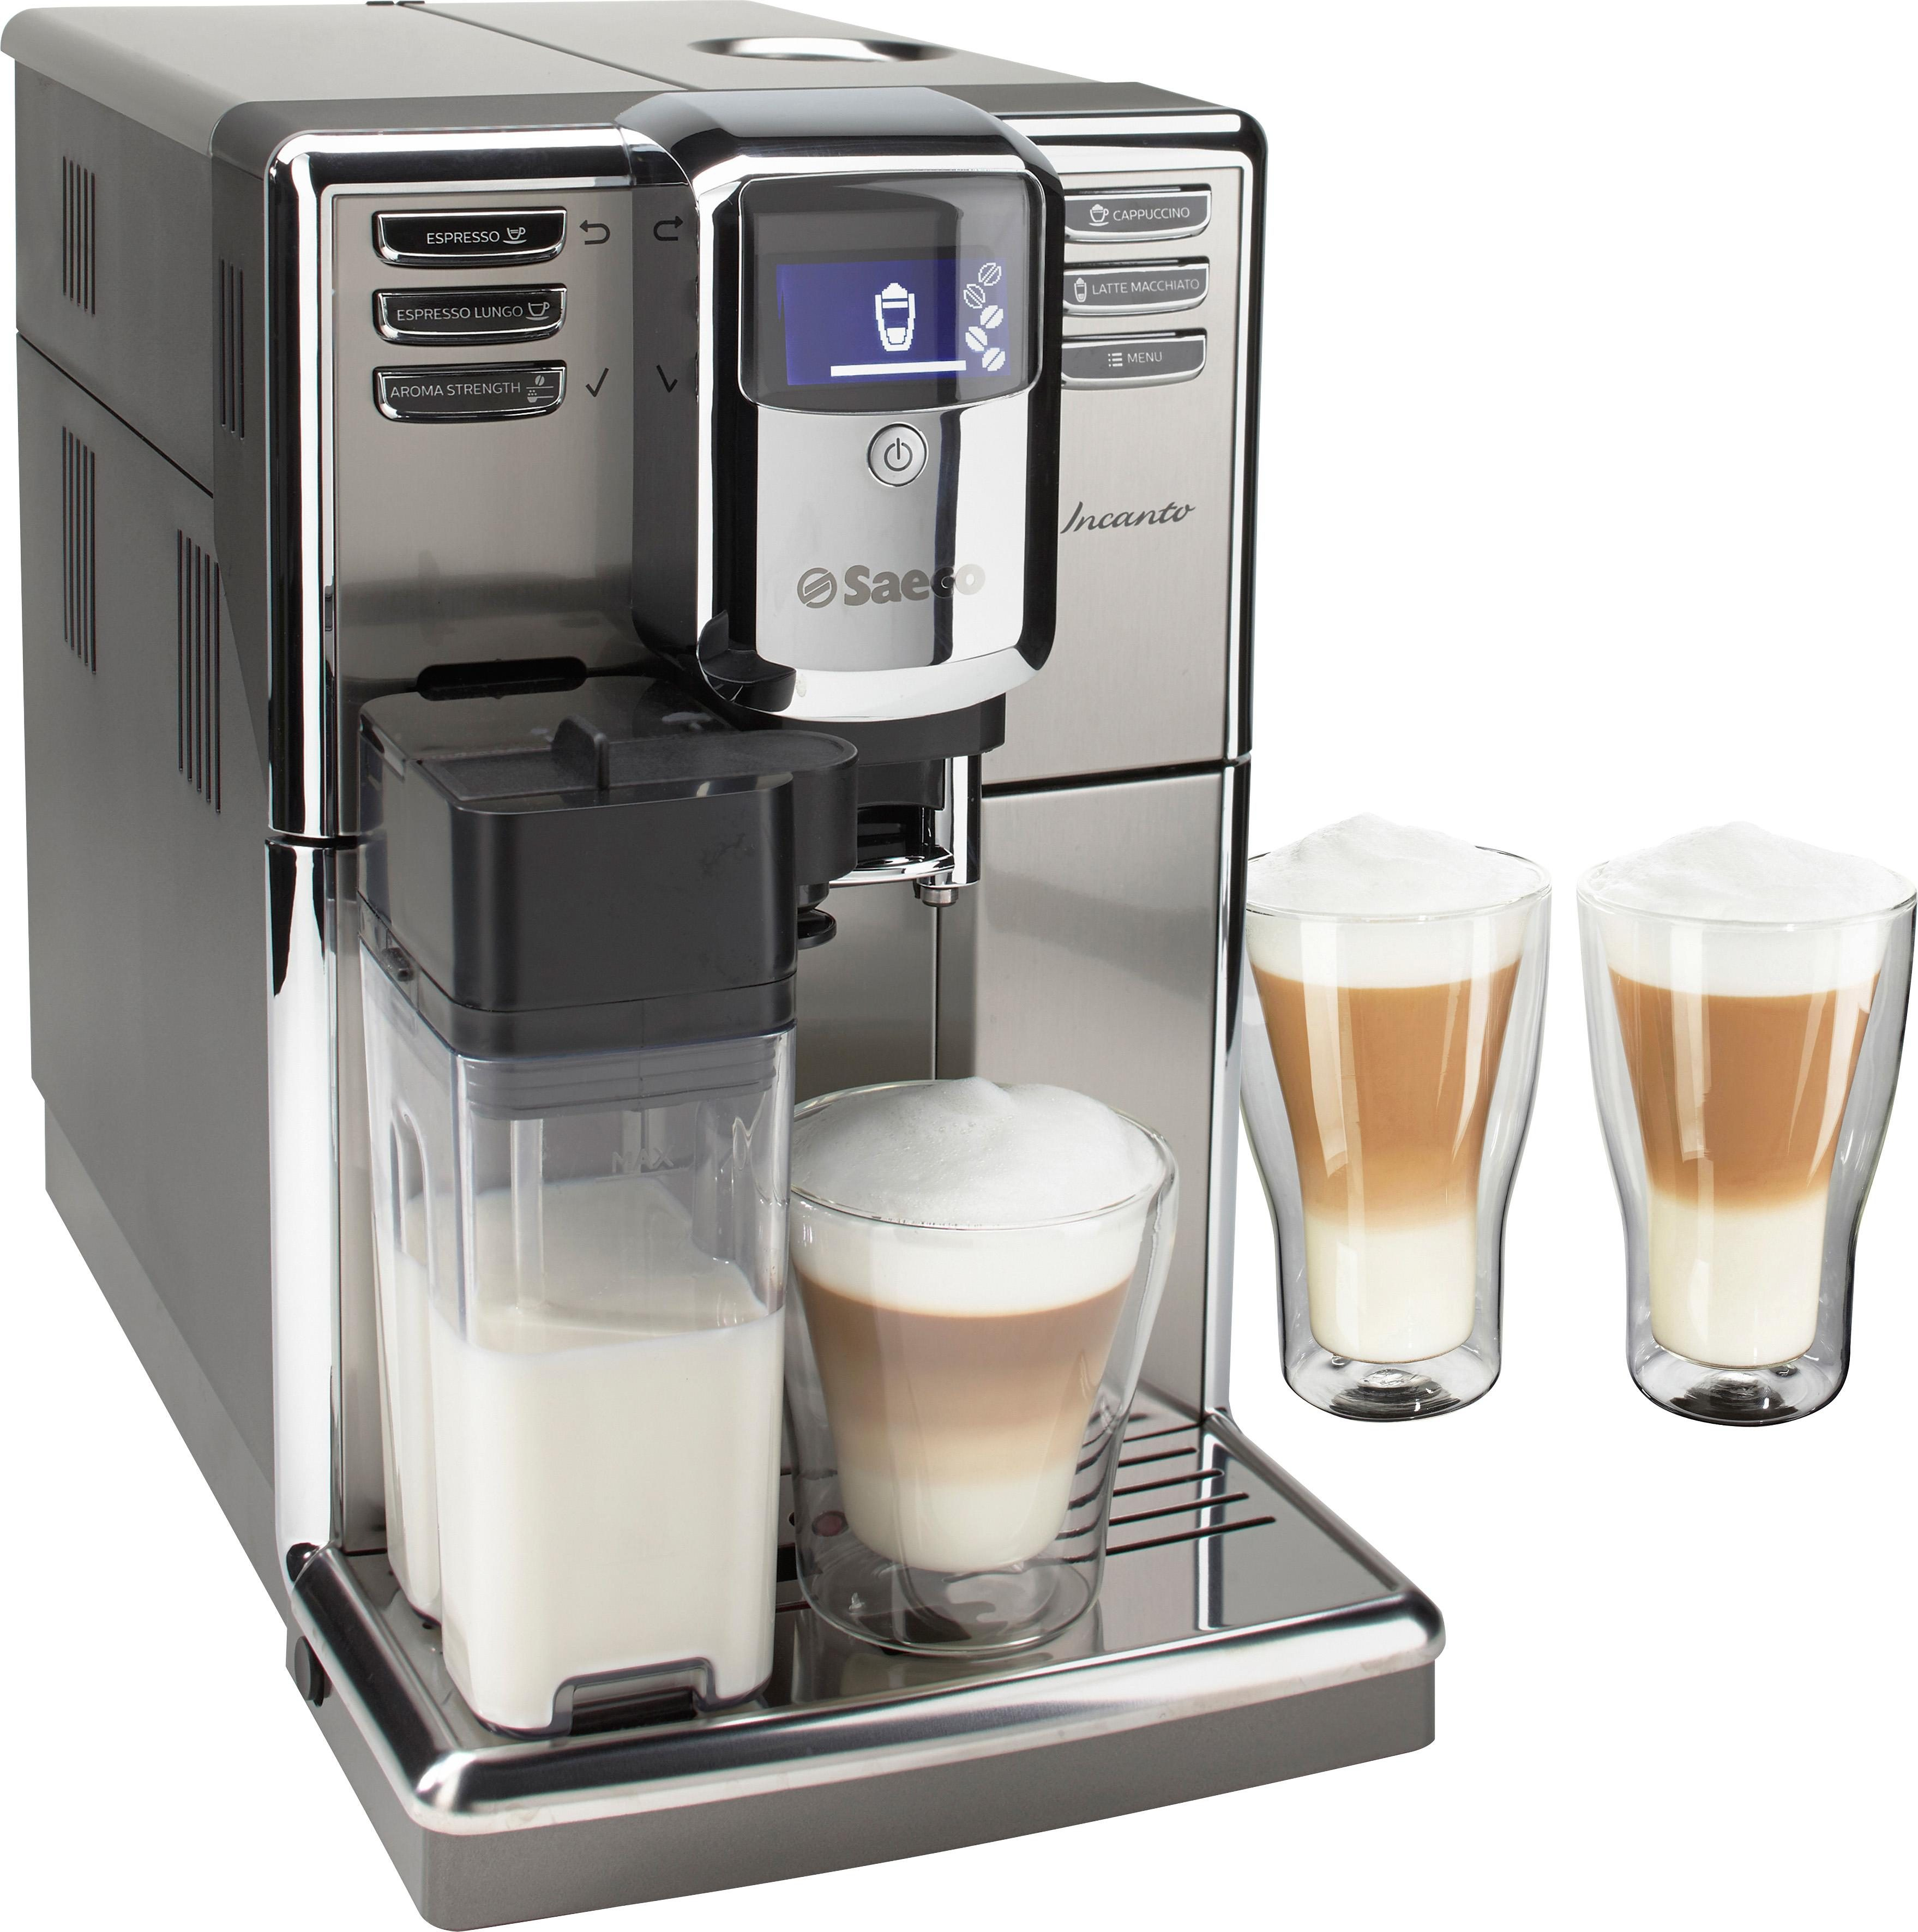 Saeco Kaffeevollautomat HD8917/01 Incanto, 1,8l Tank, Scheibenmahlwerk, inkl. 2x Latte Macchiato Gläser